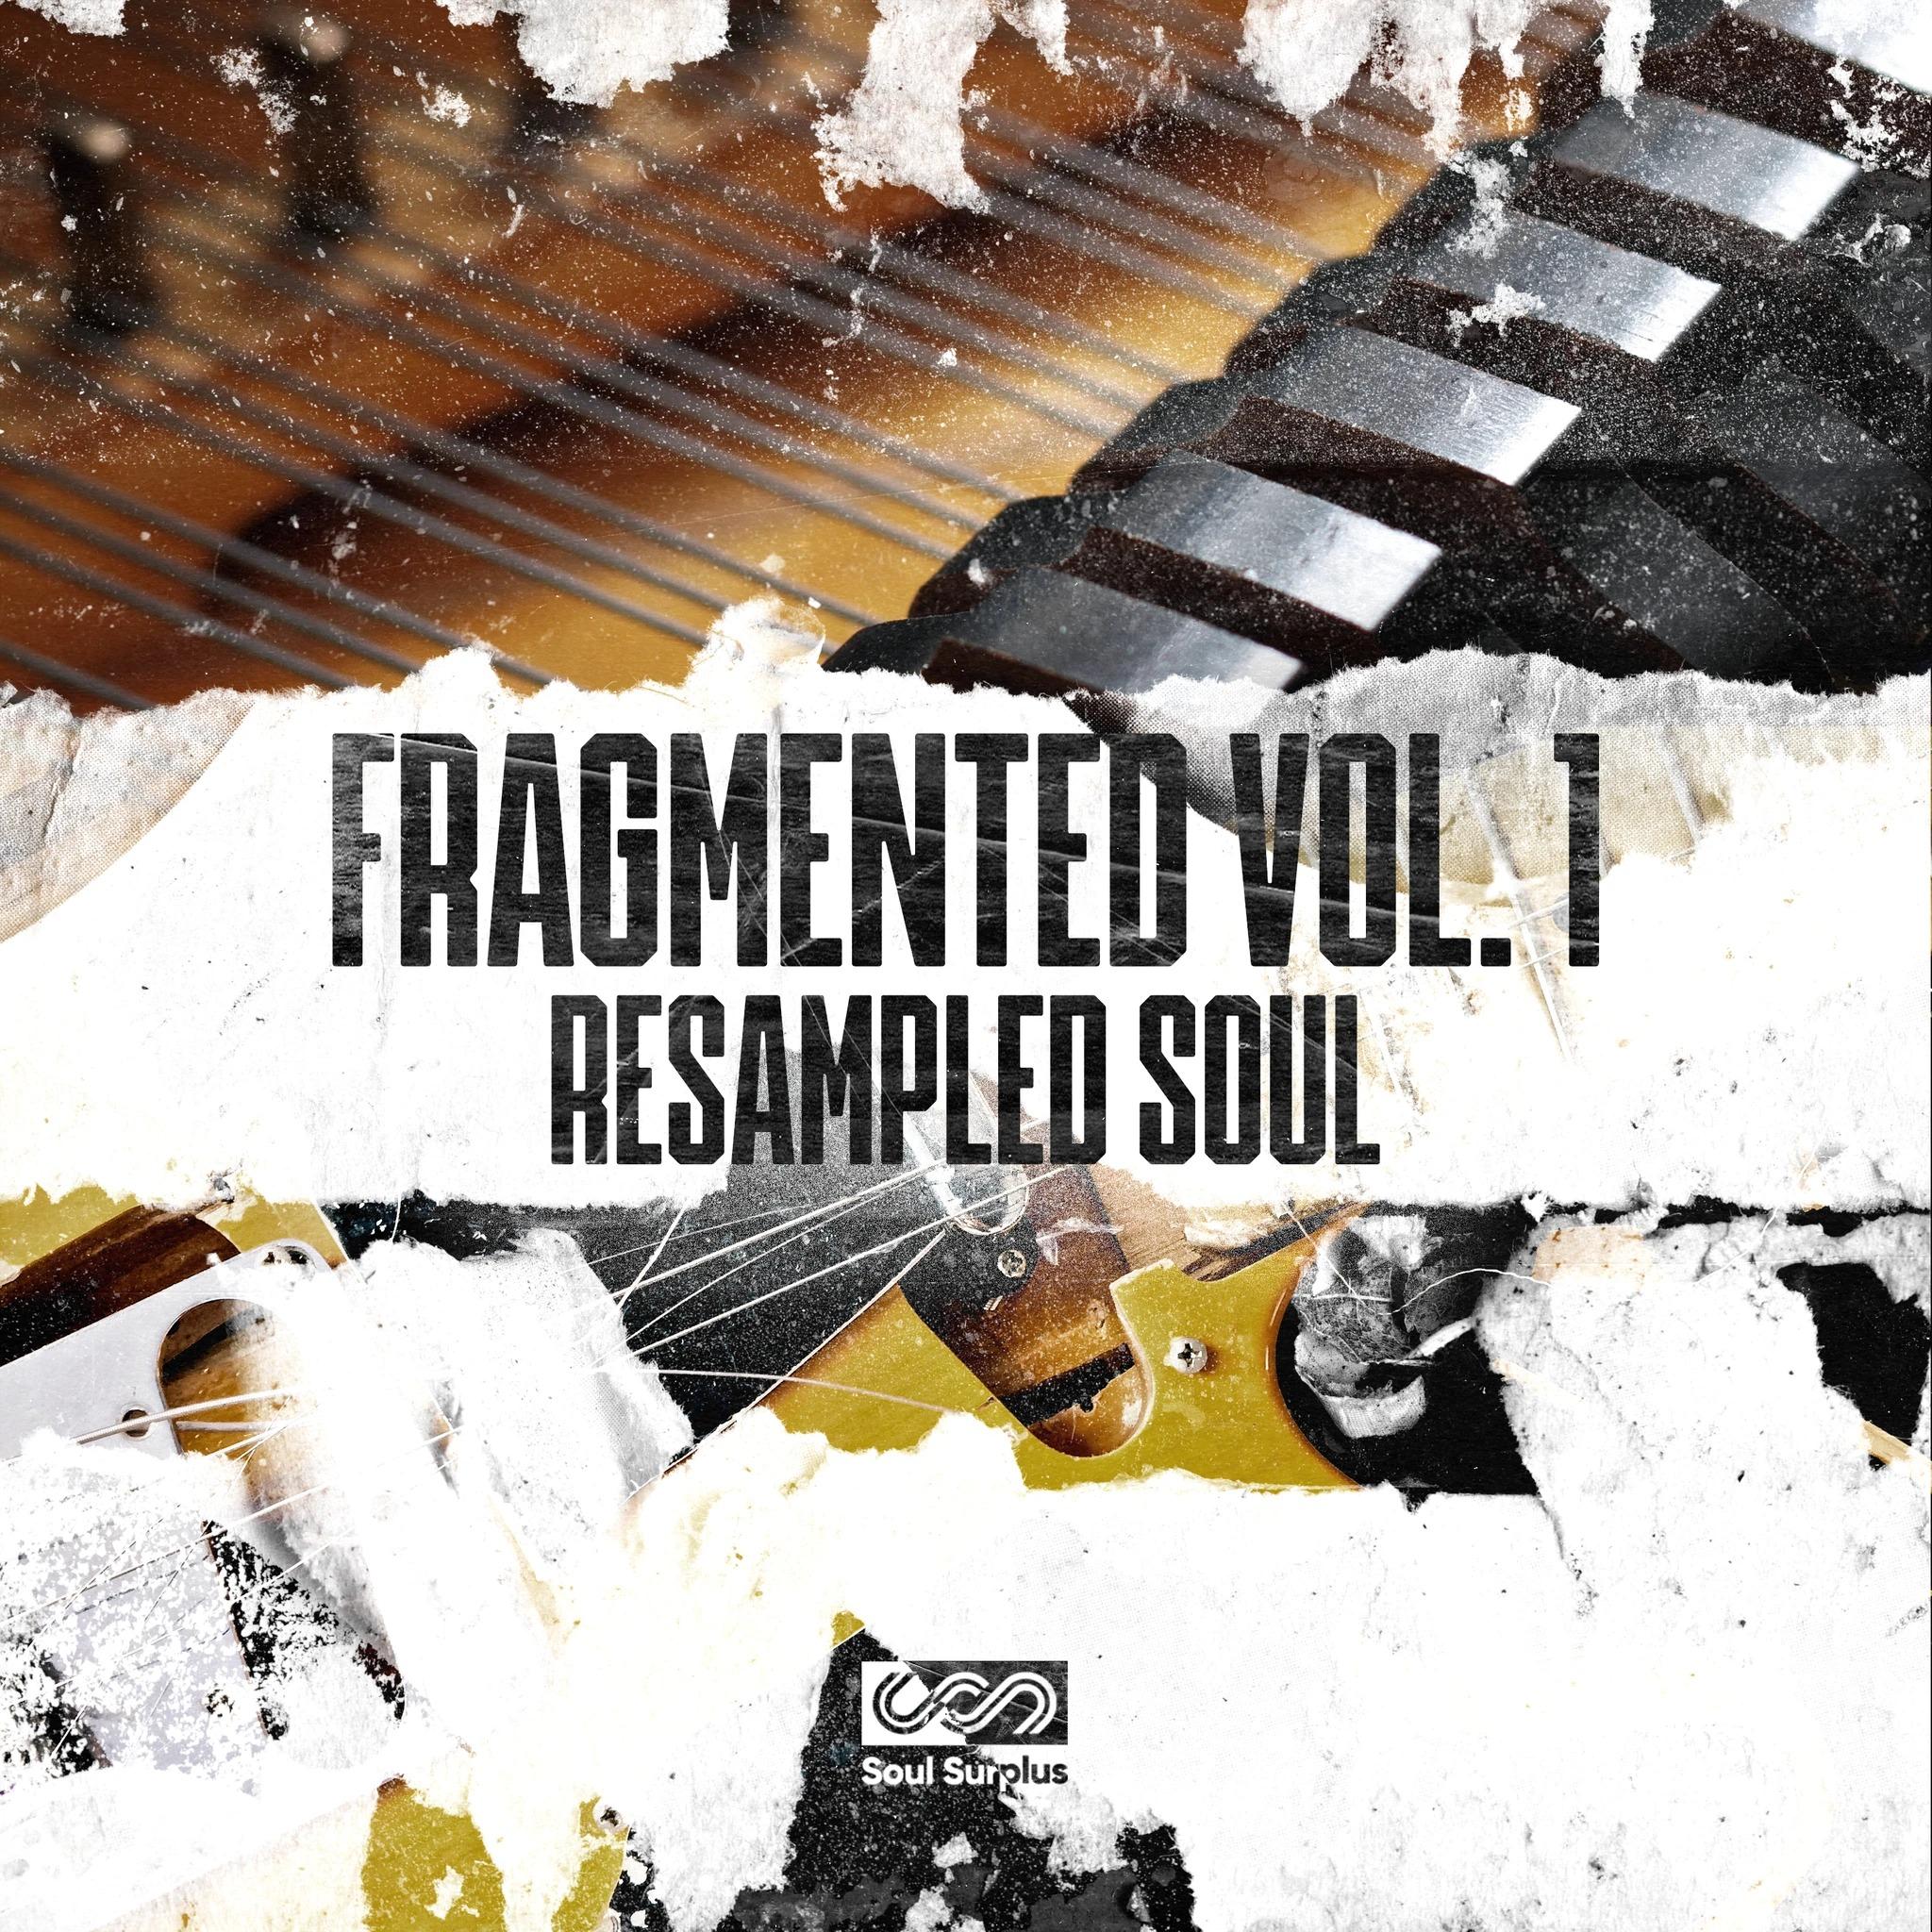 Soul Surplus - Fragmented Vol. 1 - Resampled Soul (Sample Pack)